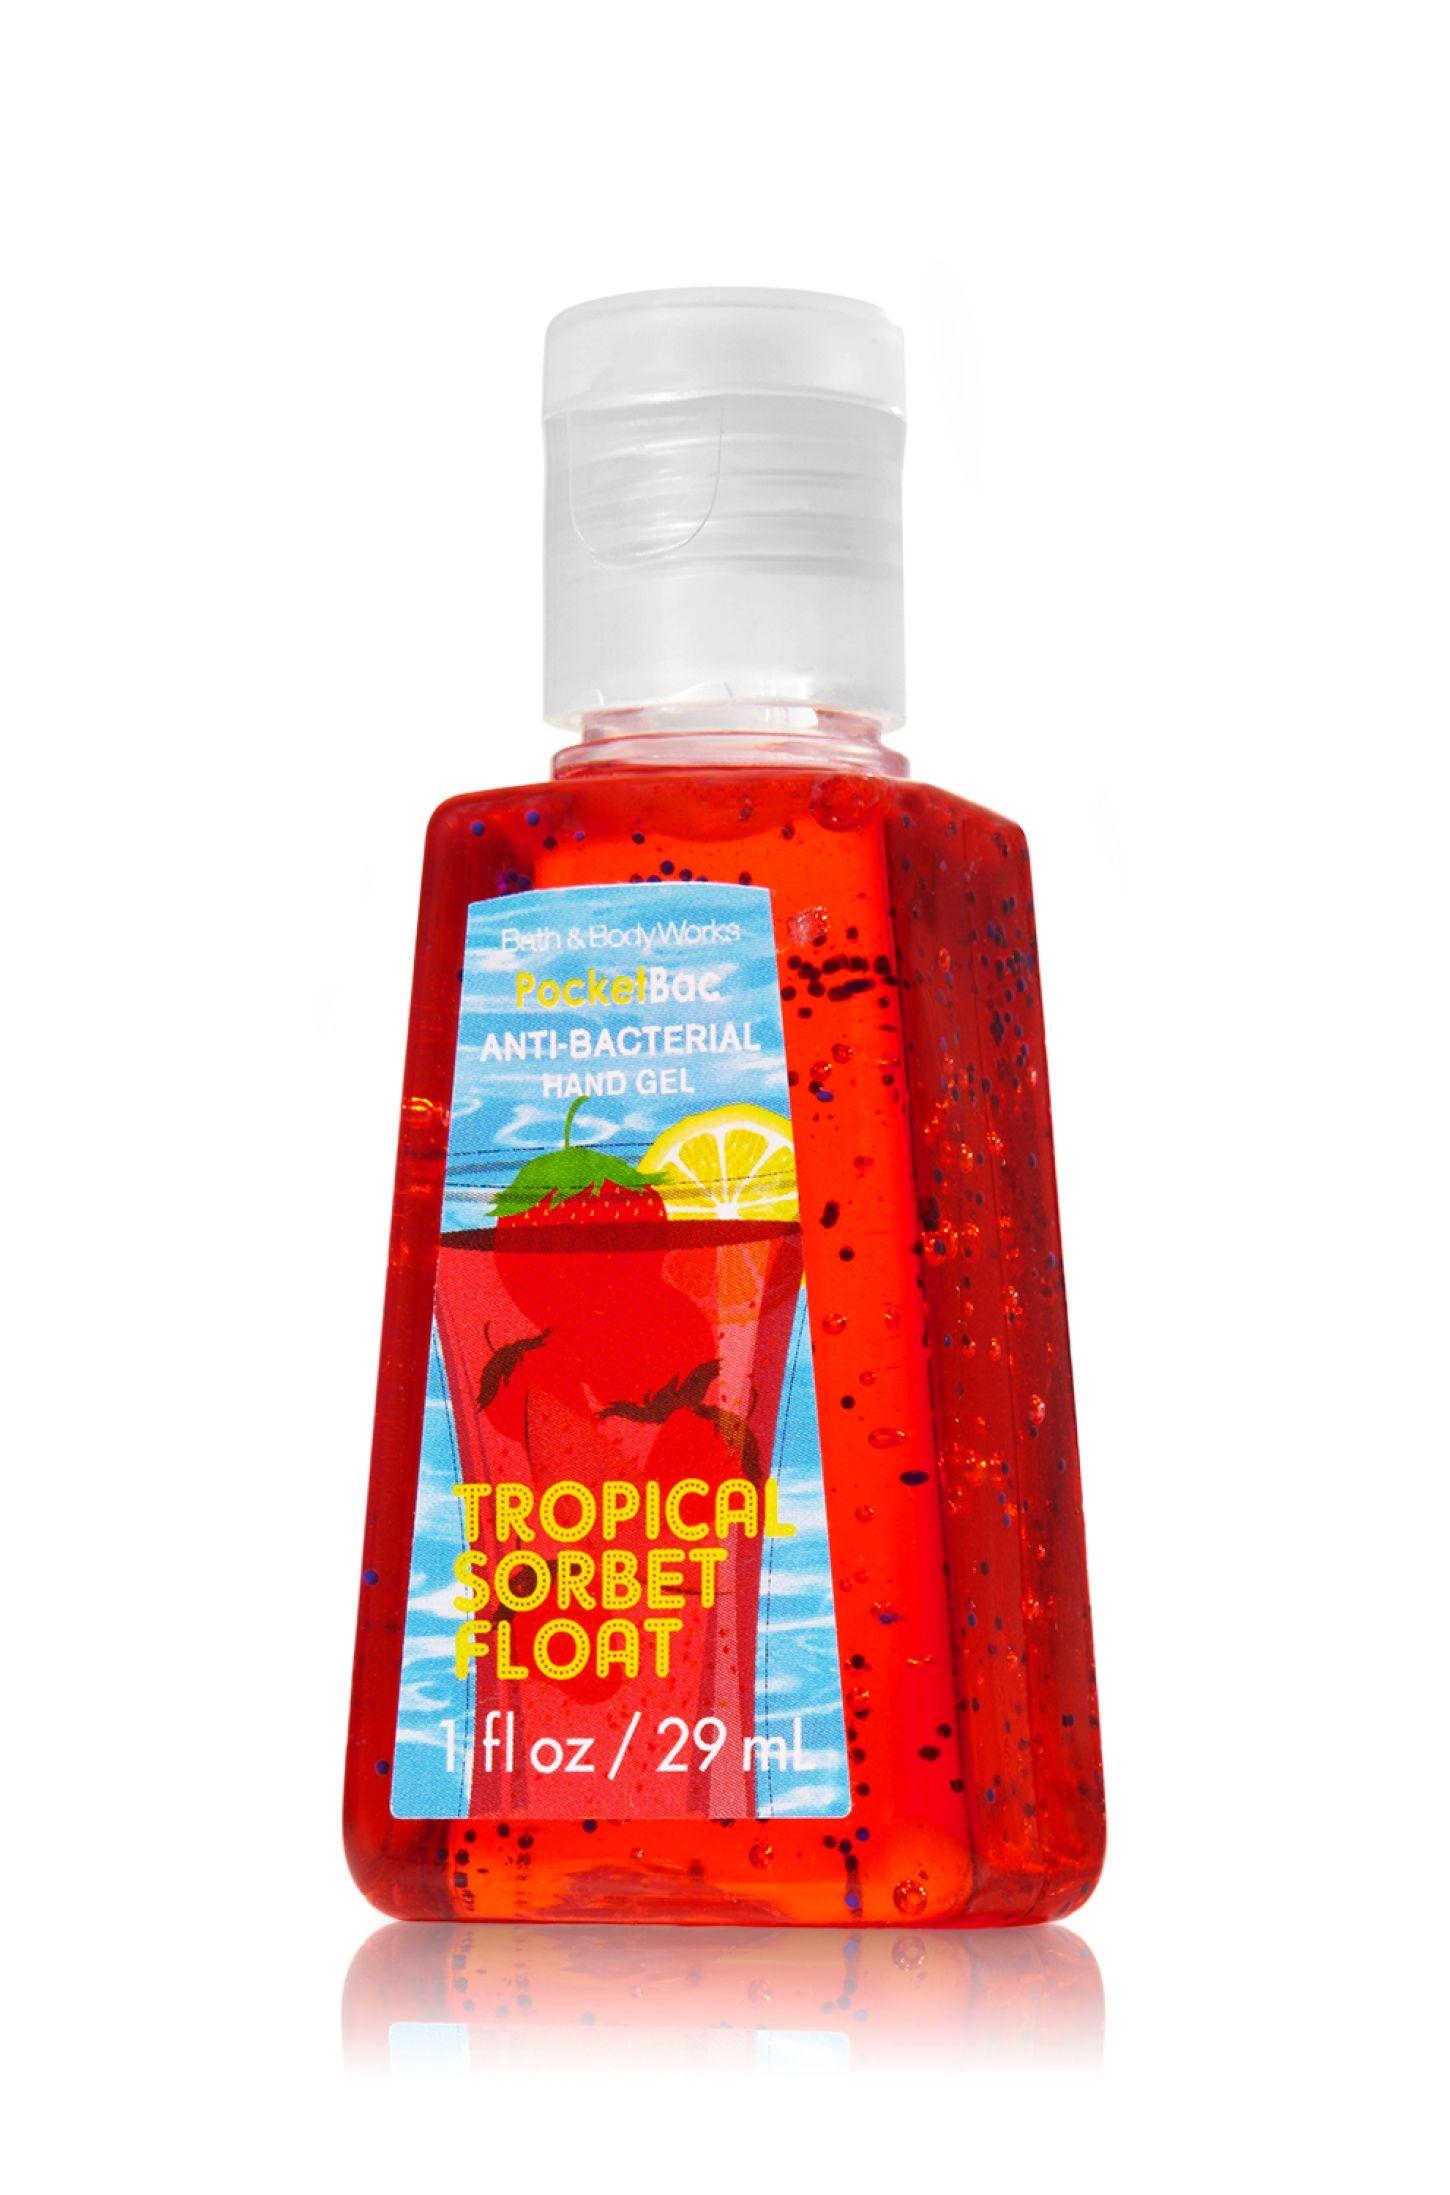 Tropical Sorbet Float Pocketbac Sanitizing Hand Gel Anti